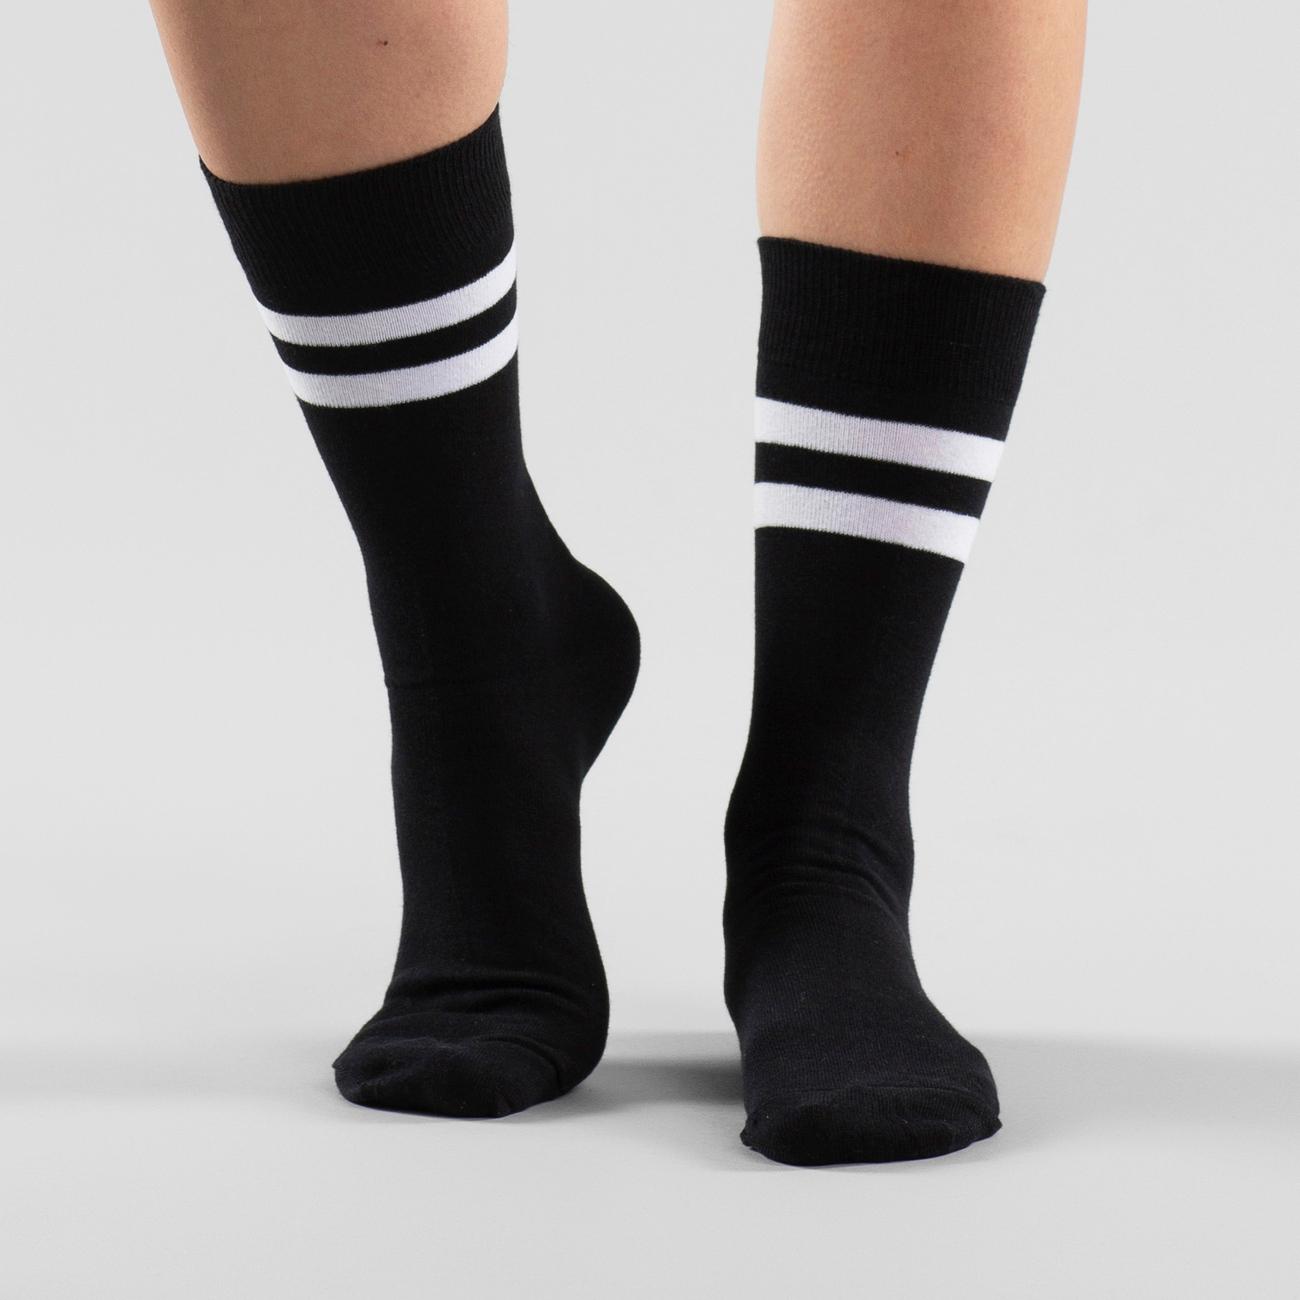 Socks Sigtuna Double Stripes